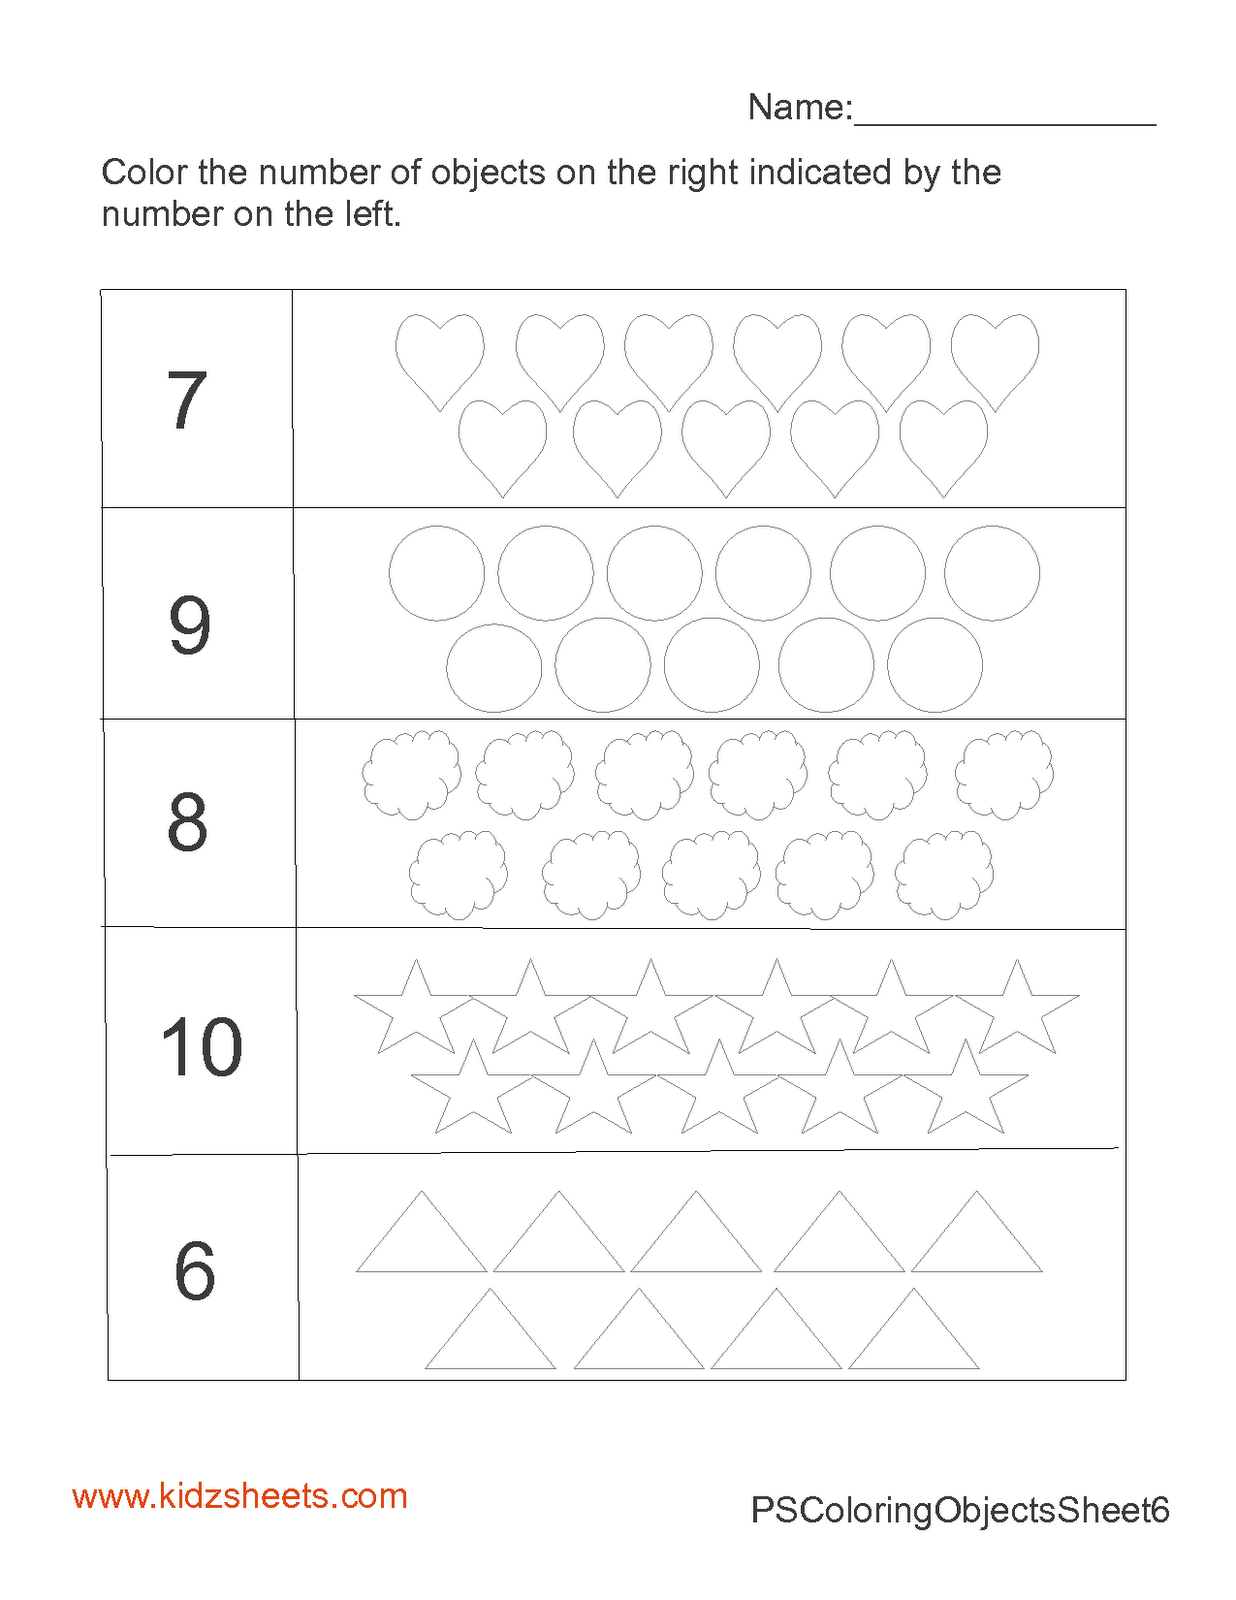 kidz worksheets preschool count u0026 color 6 10 worksheet1